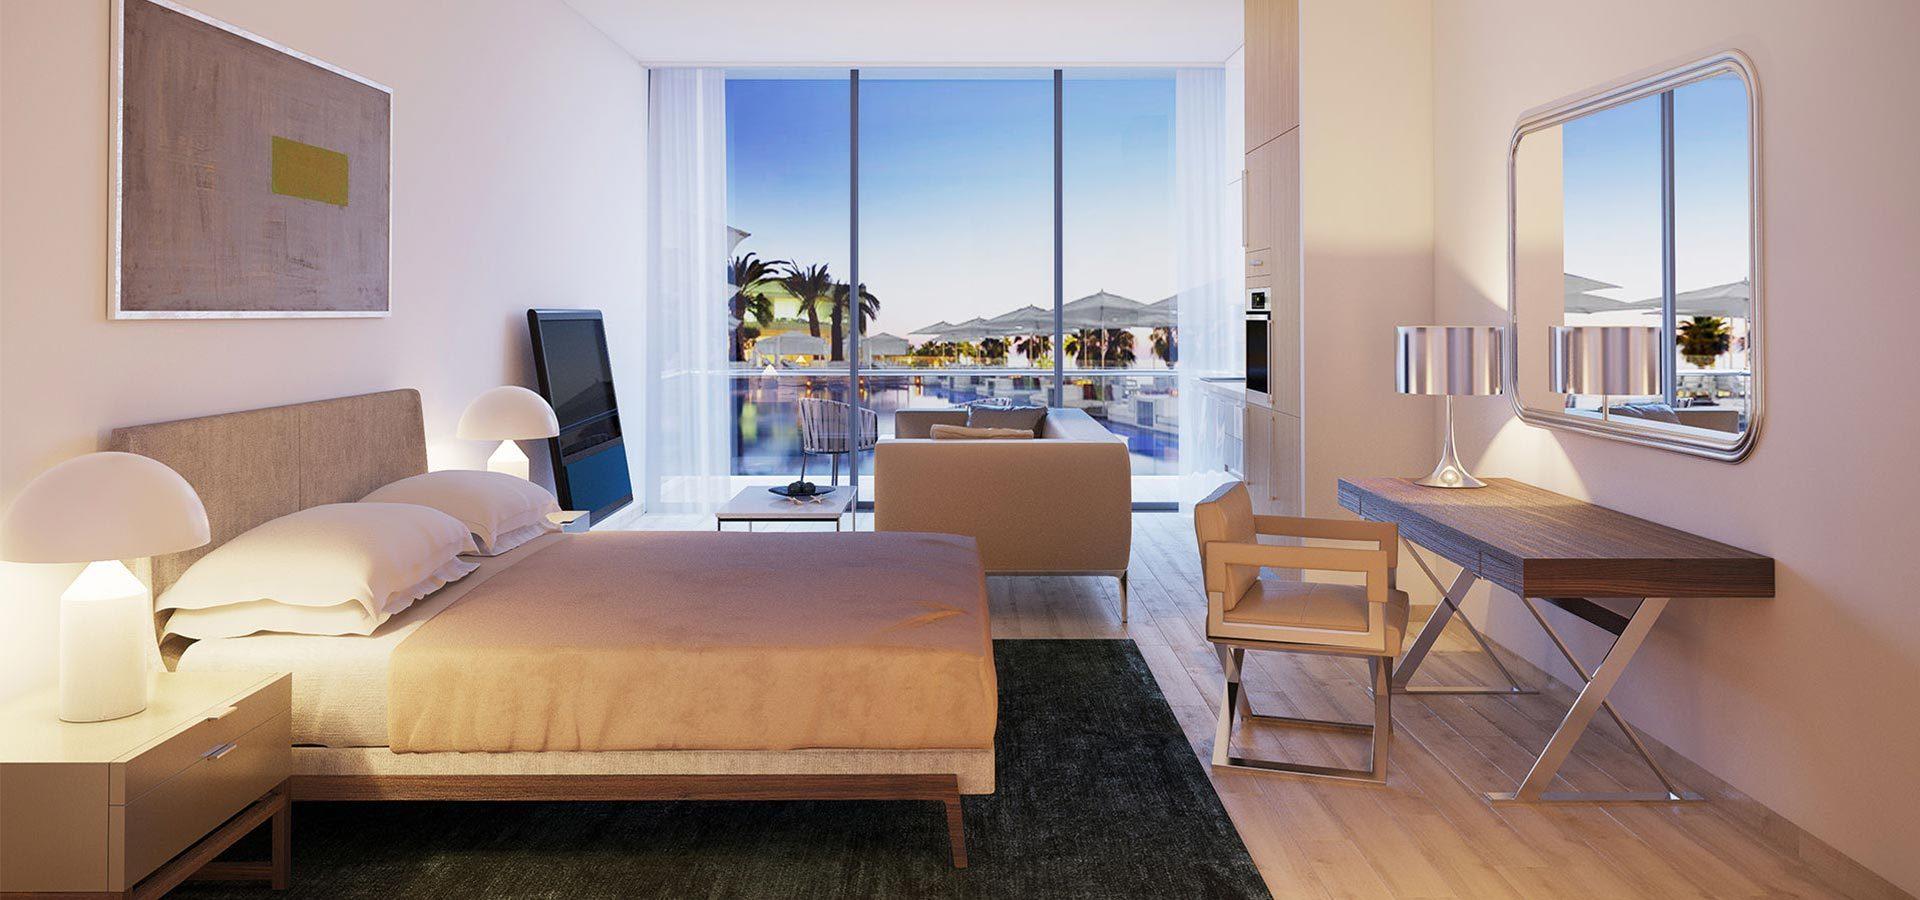 Aldar Mayan Apartments at Yas Island, Abu Dhabi